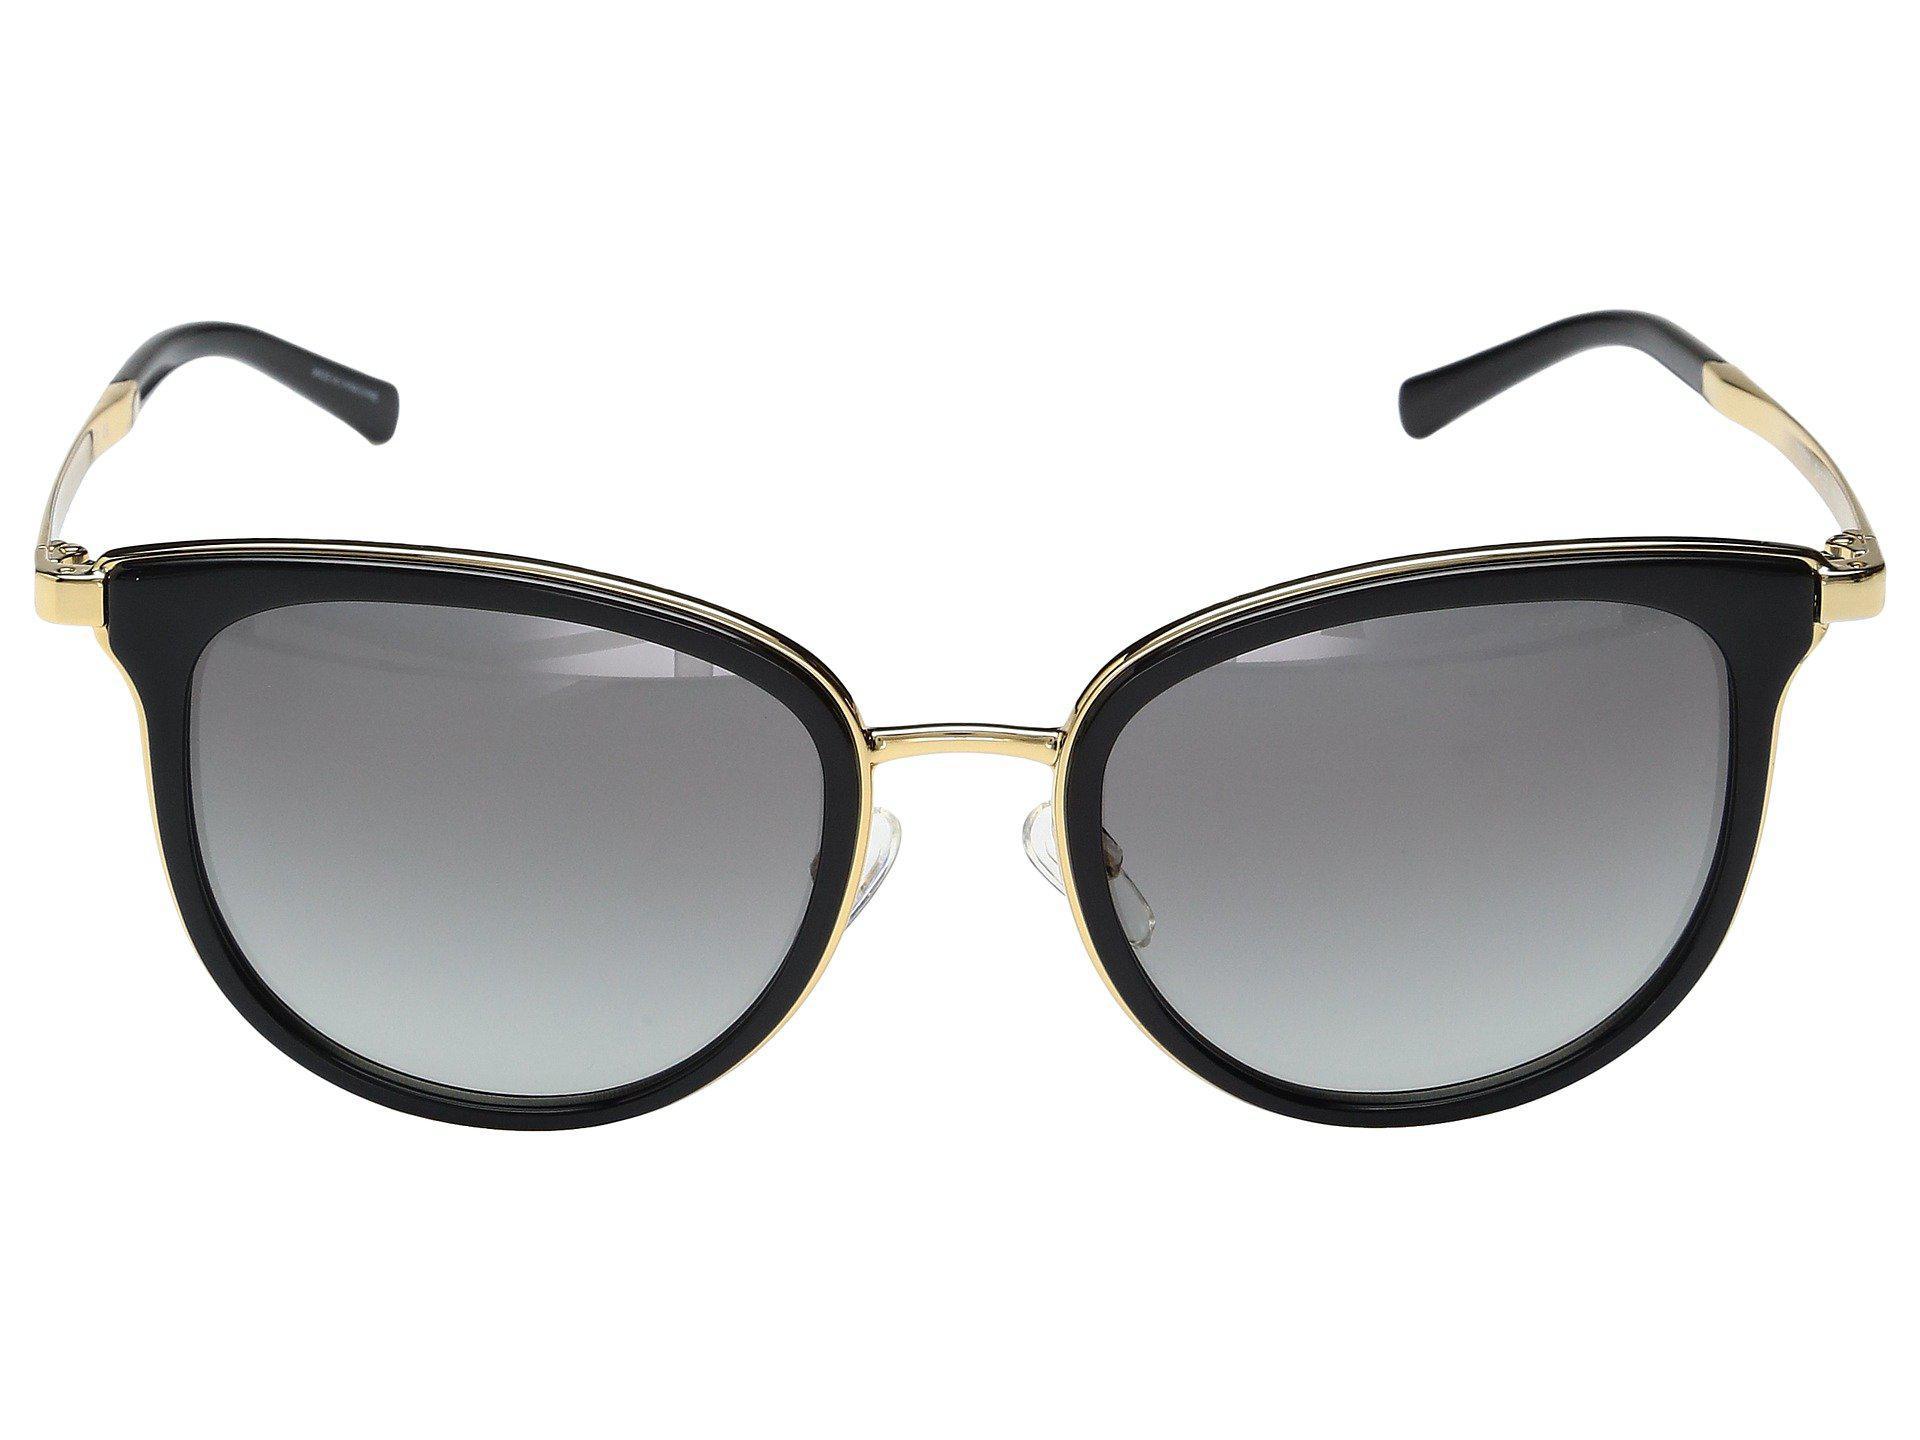 1ffa546243237 Michael Kors - Adrianna I Mk1010 (black gold) Fashion Sunglasses - Lyst.  View fullscreen